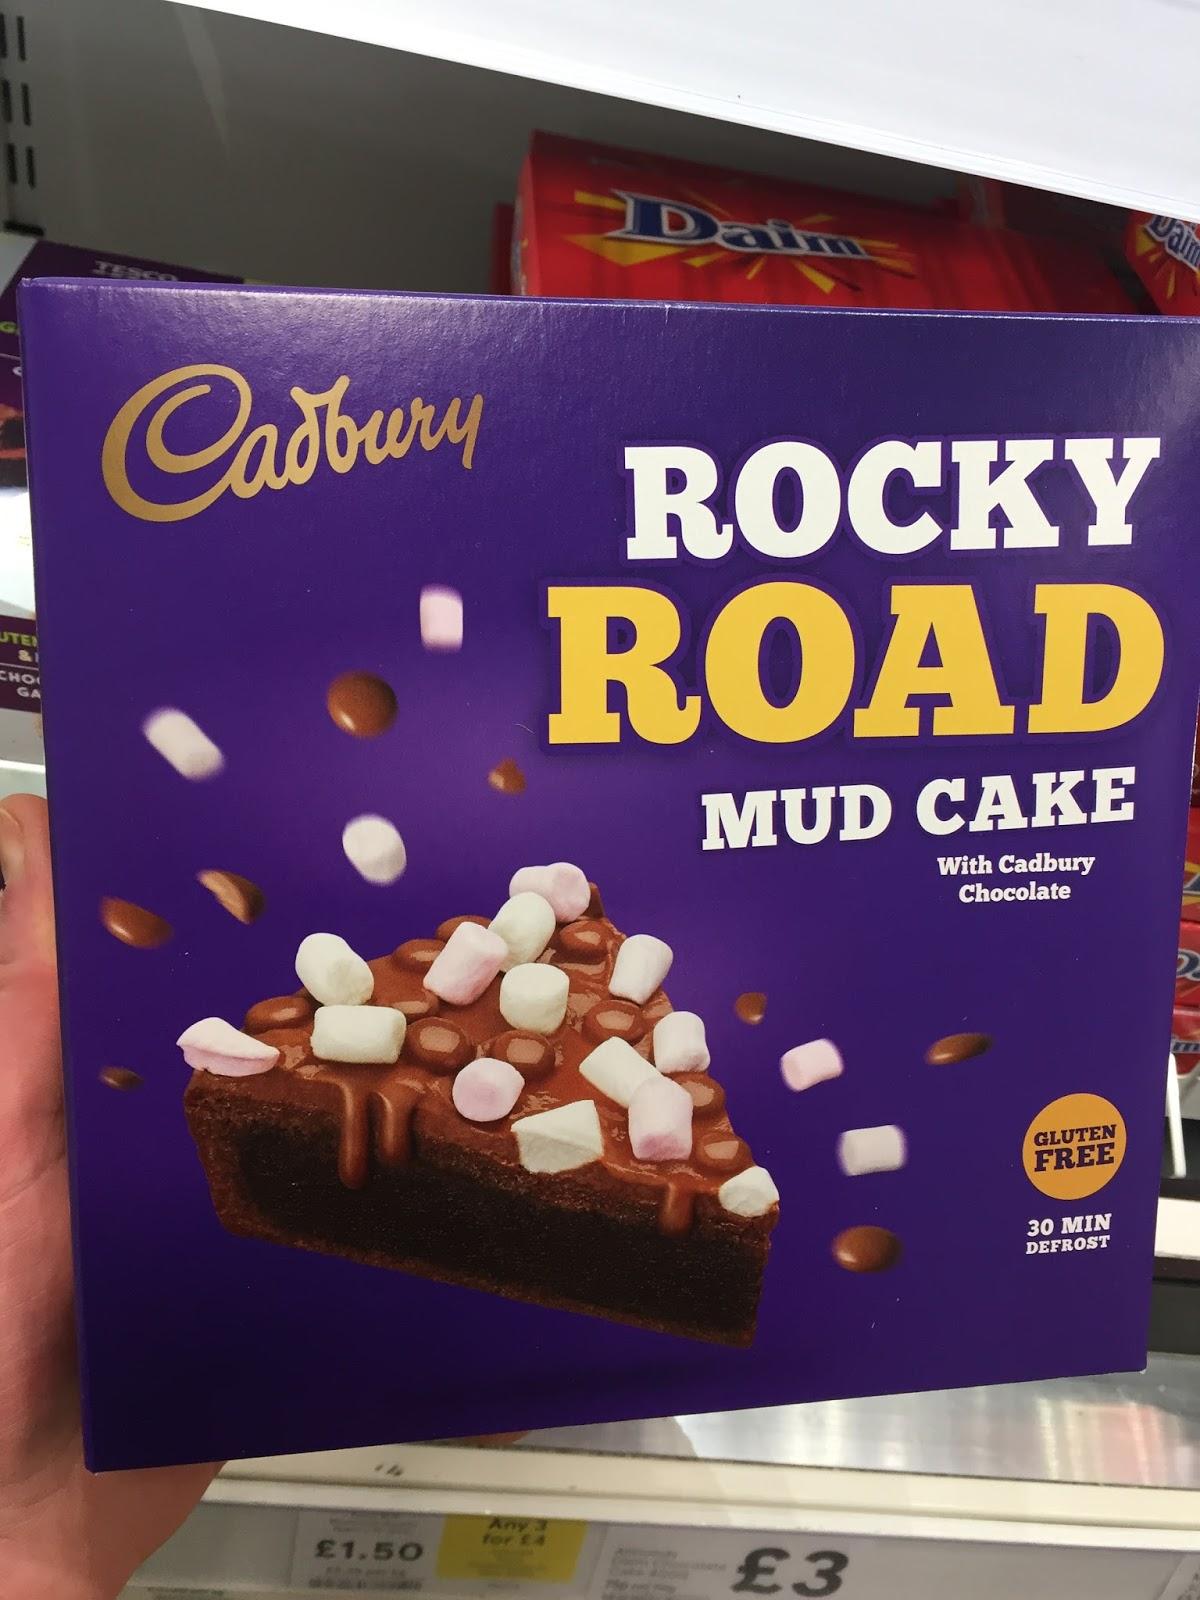 Chocolate Mud Cake Vs Chocolate Cake